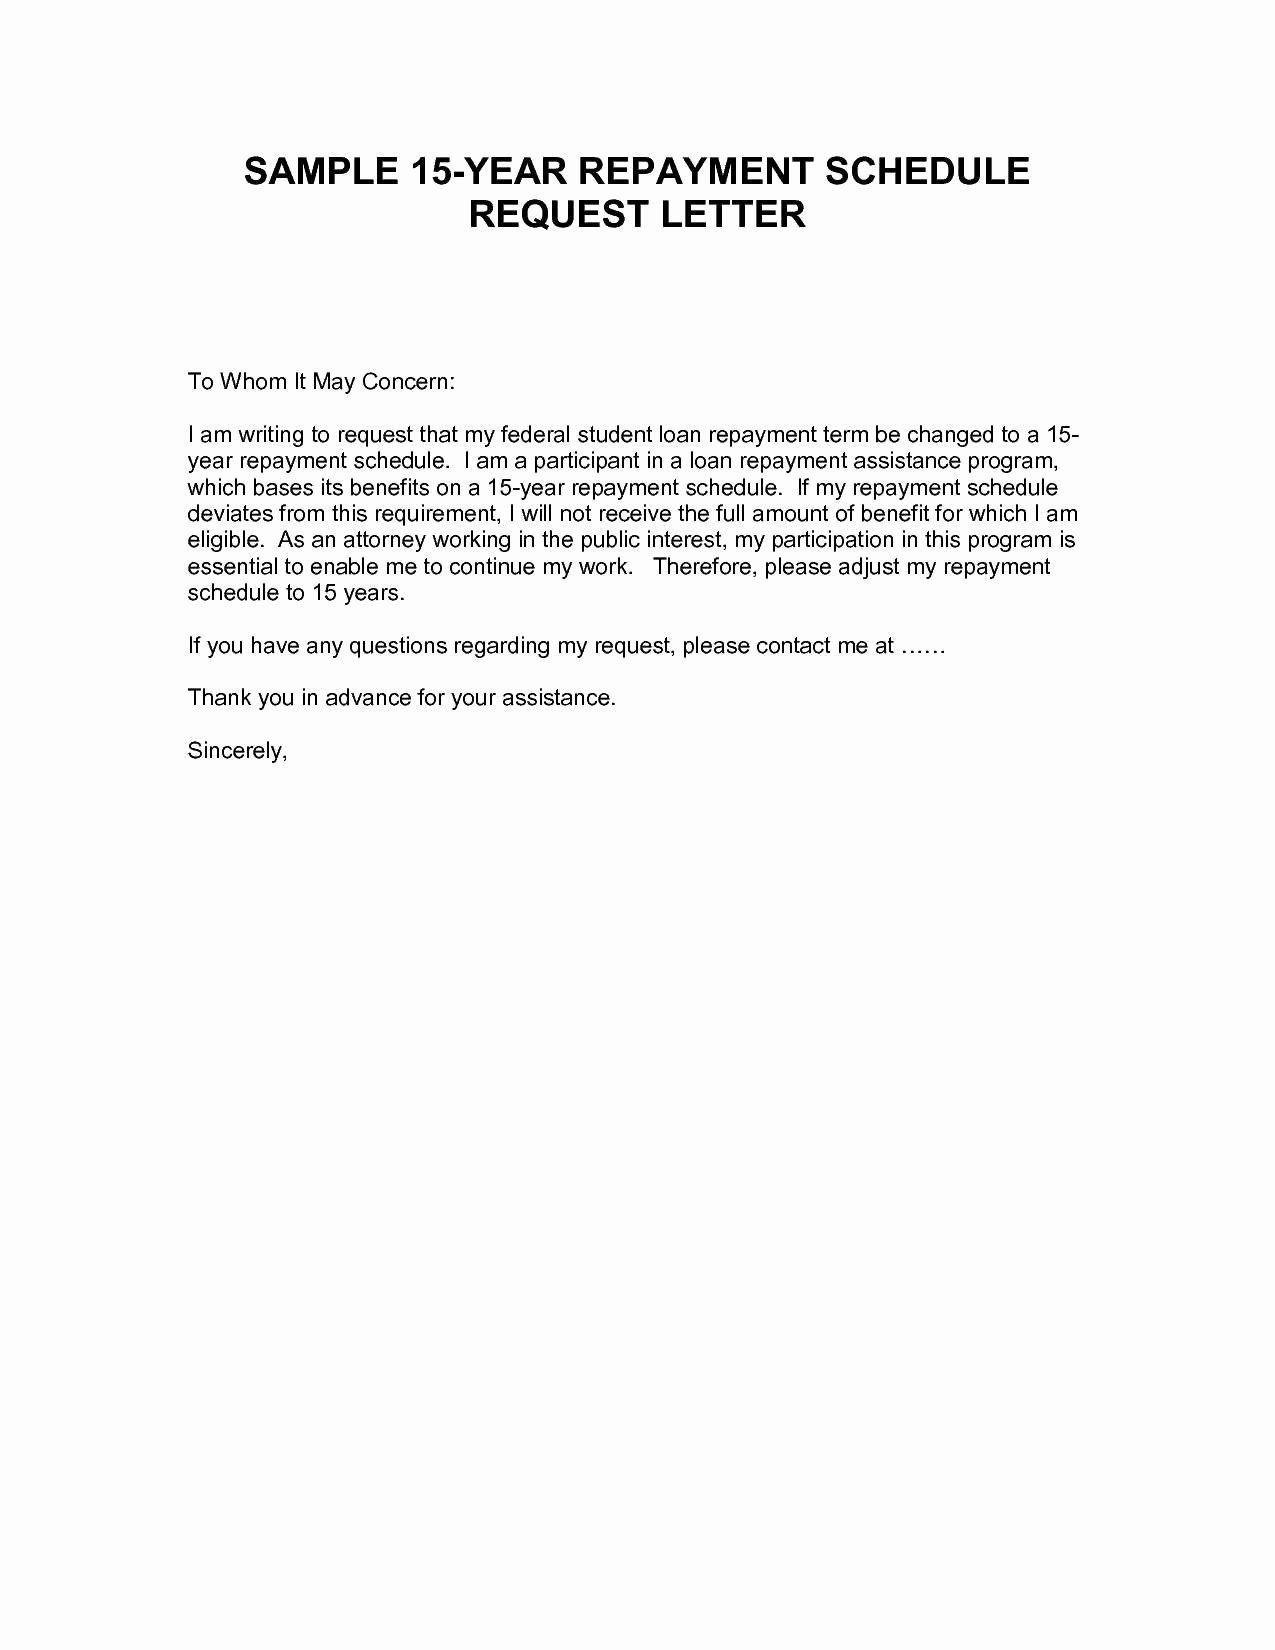 Personal Loan Letter Format Elegant Personal Loan Repayment Letter Template Download In 2020 Lettering Personal Loans Letter Templates